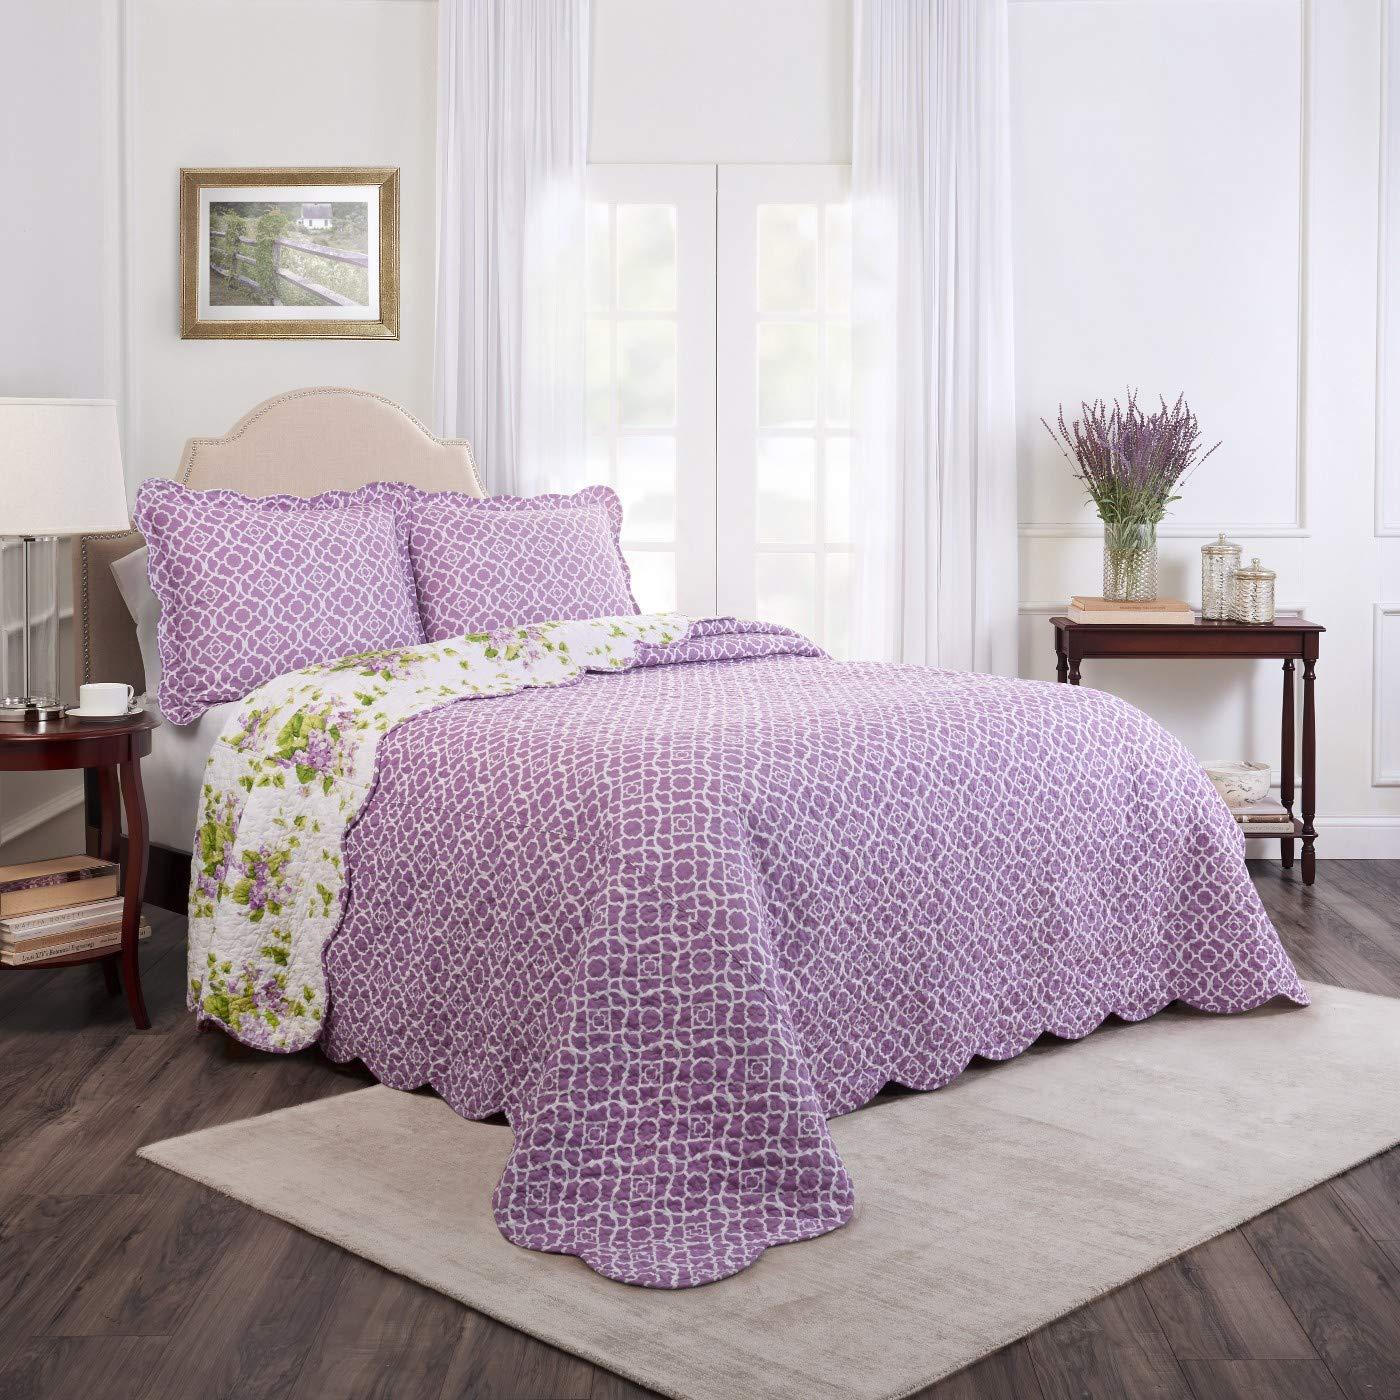 WAVERLY 3-Piece Reversible Quilt Set 100/% Cotton Size Lilac Dreams Full//Queen Color Violet New